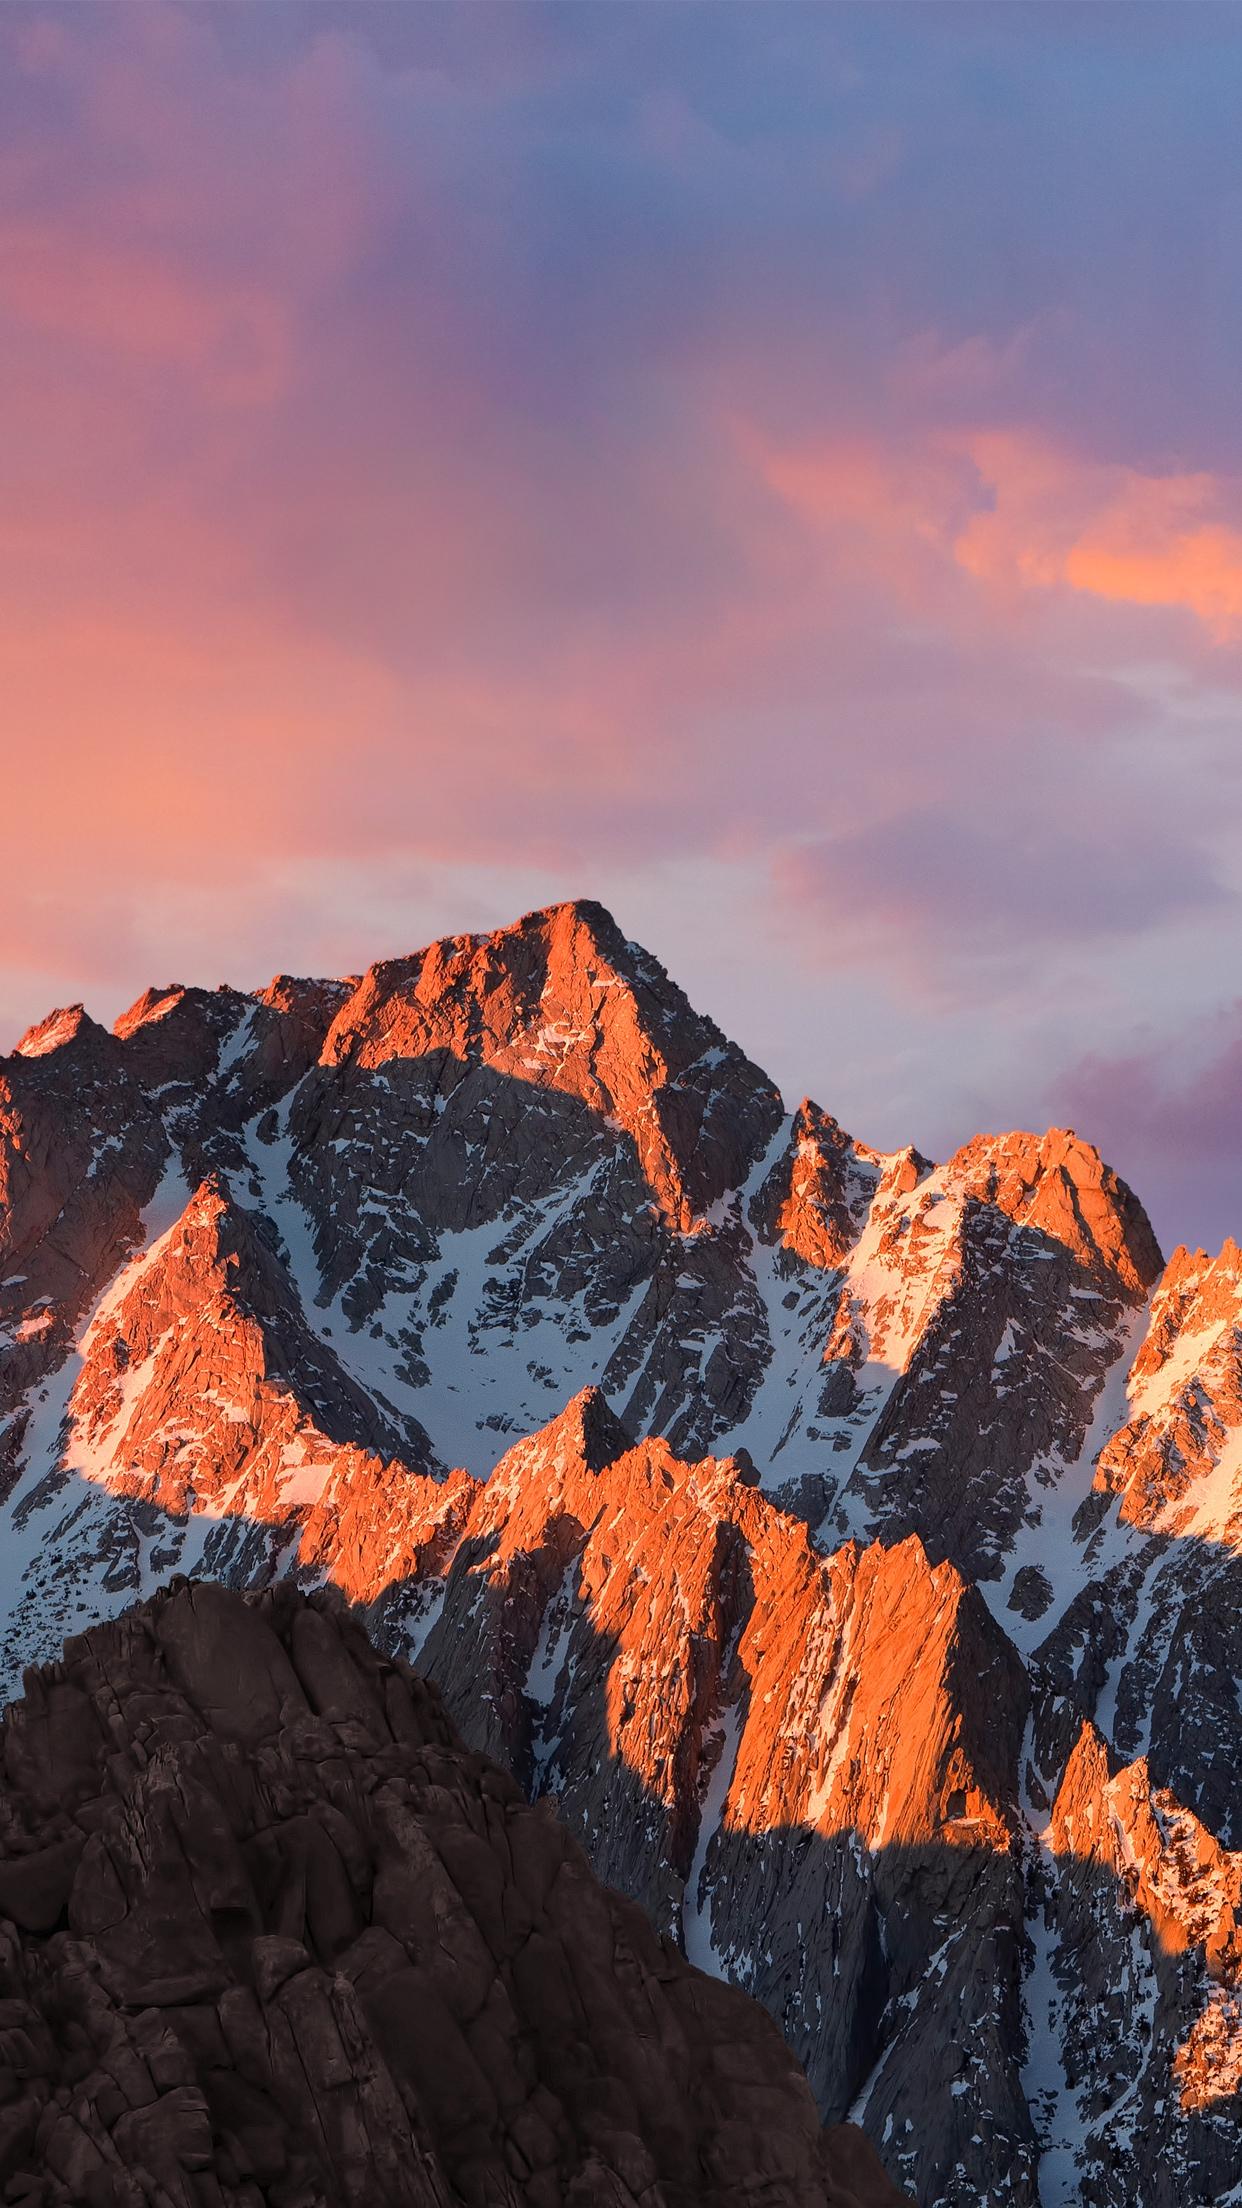 Download Macos Sierra Wallpaper Mac Background For Iphone